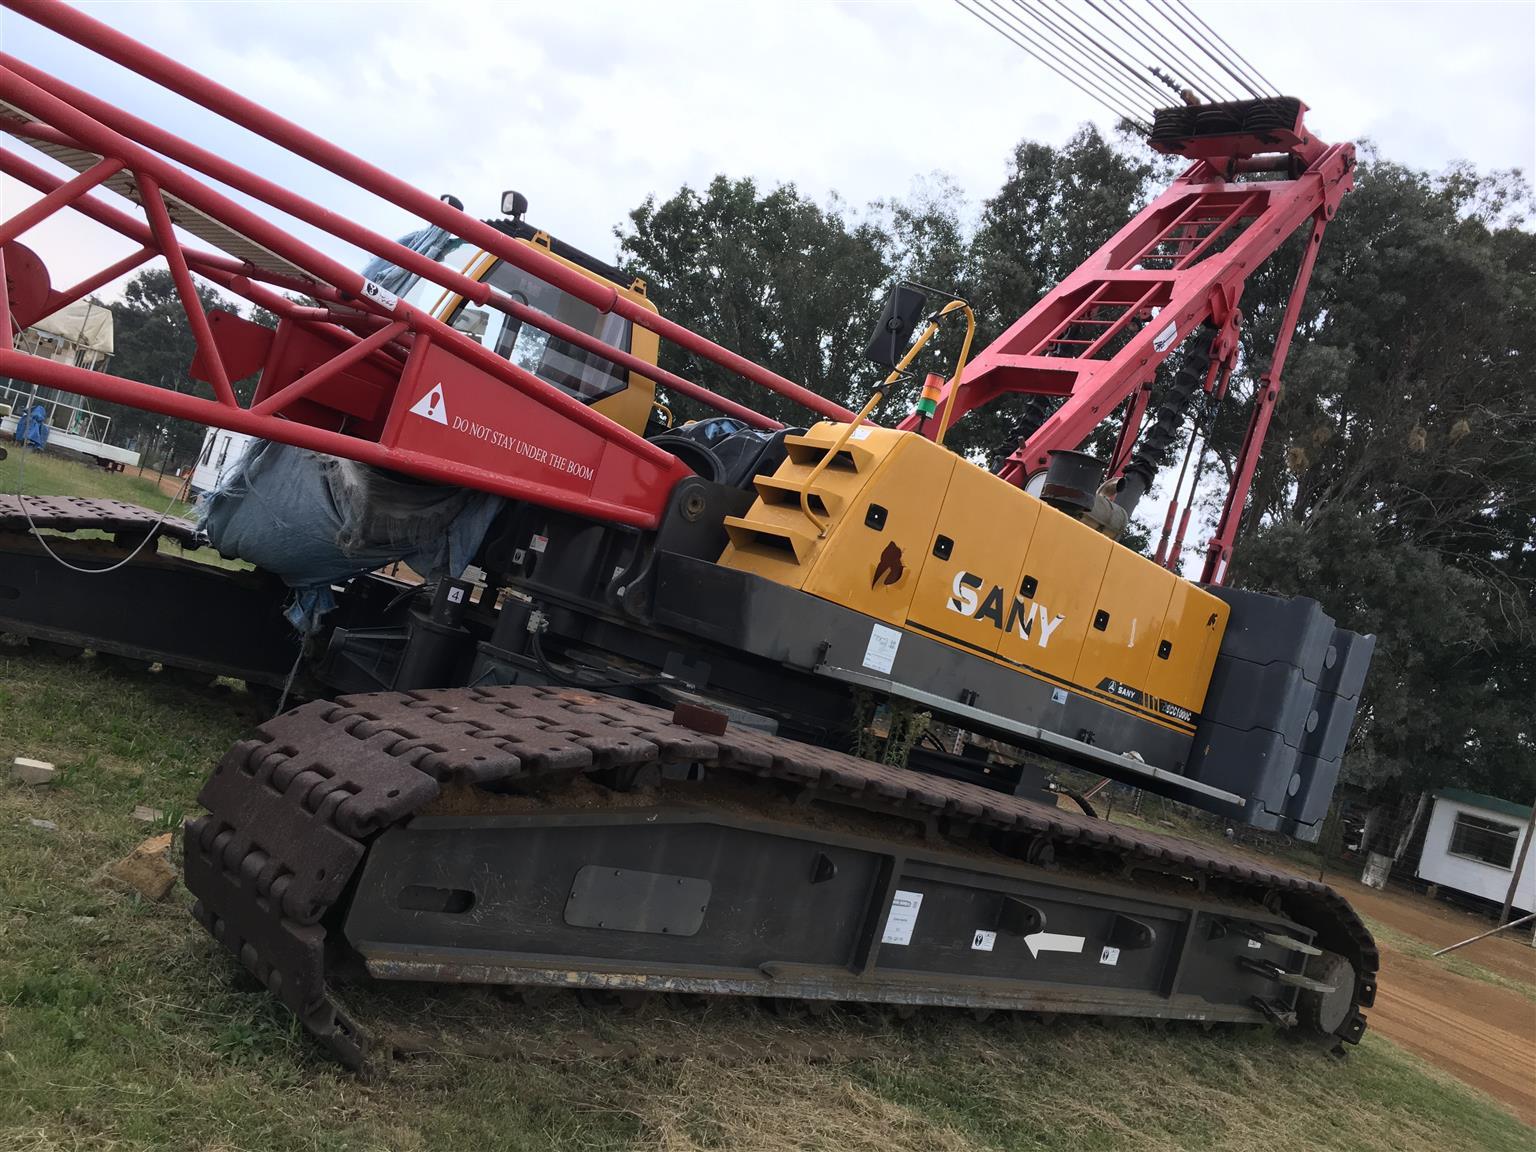 105T Sany Crawler Crane